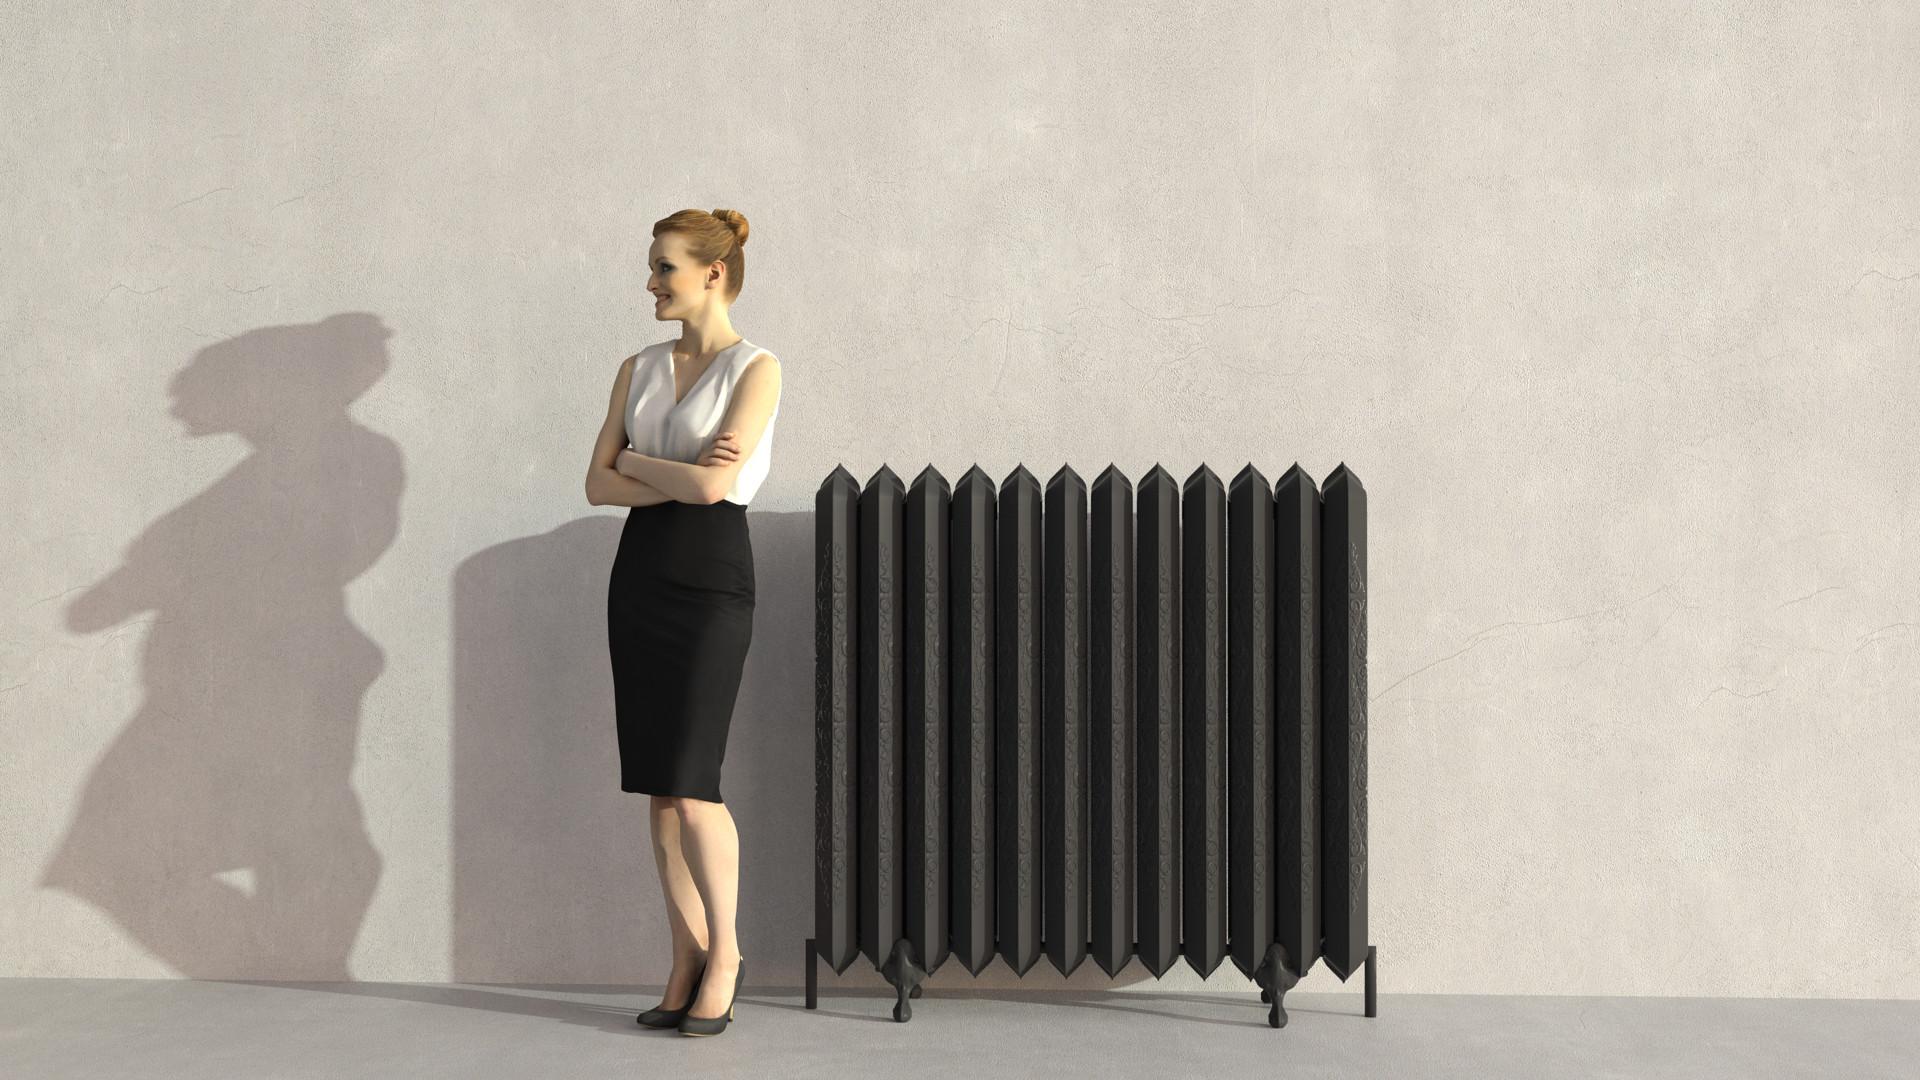 Duane kemp cast iron radiator 05